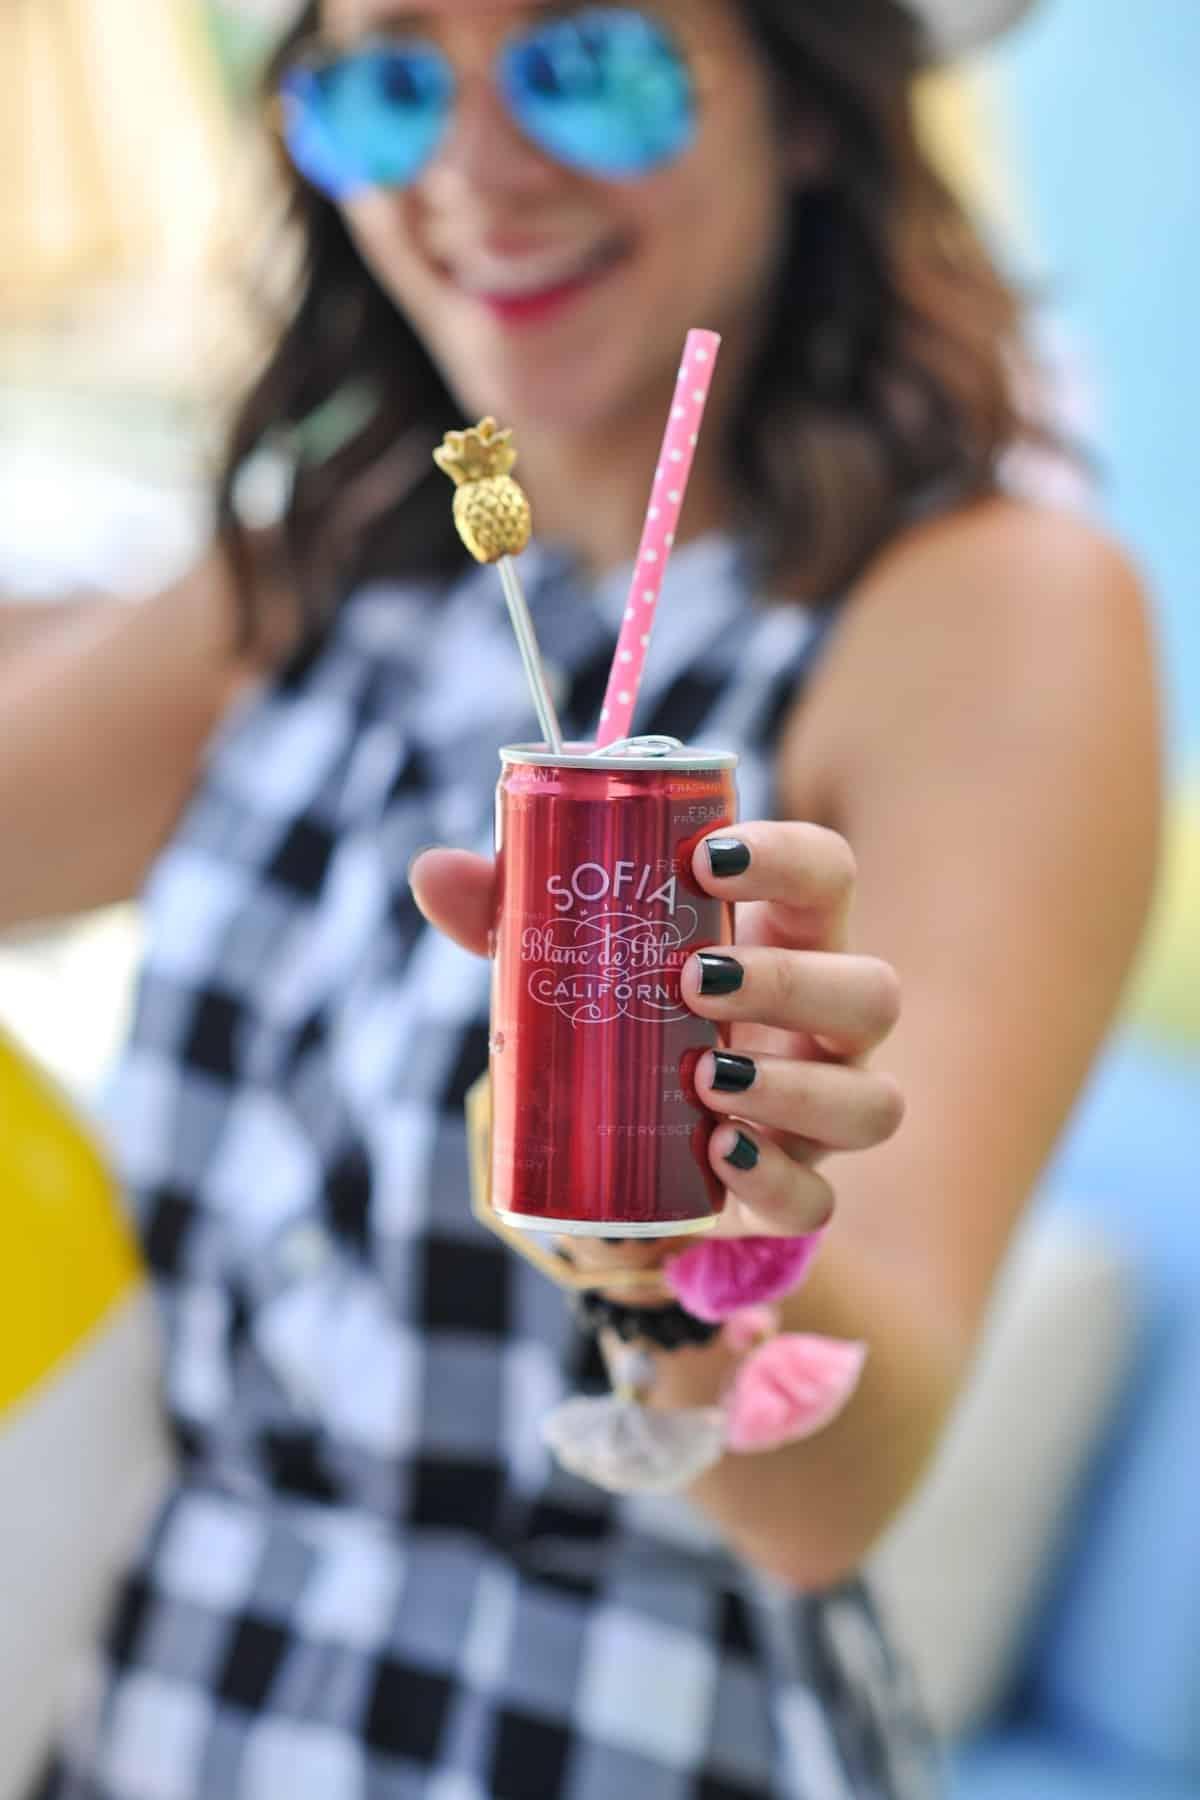 adult pool party ideas, swan pool float, flamingo inflatable drink holder via @mystylevita - 14